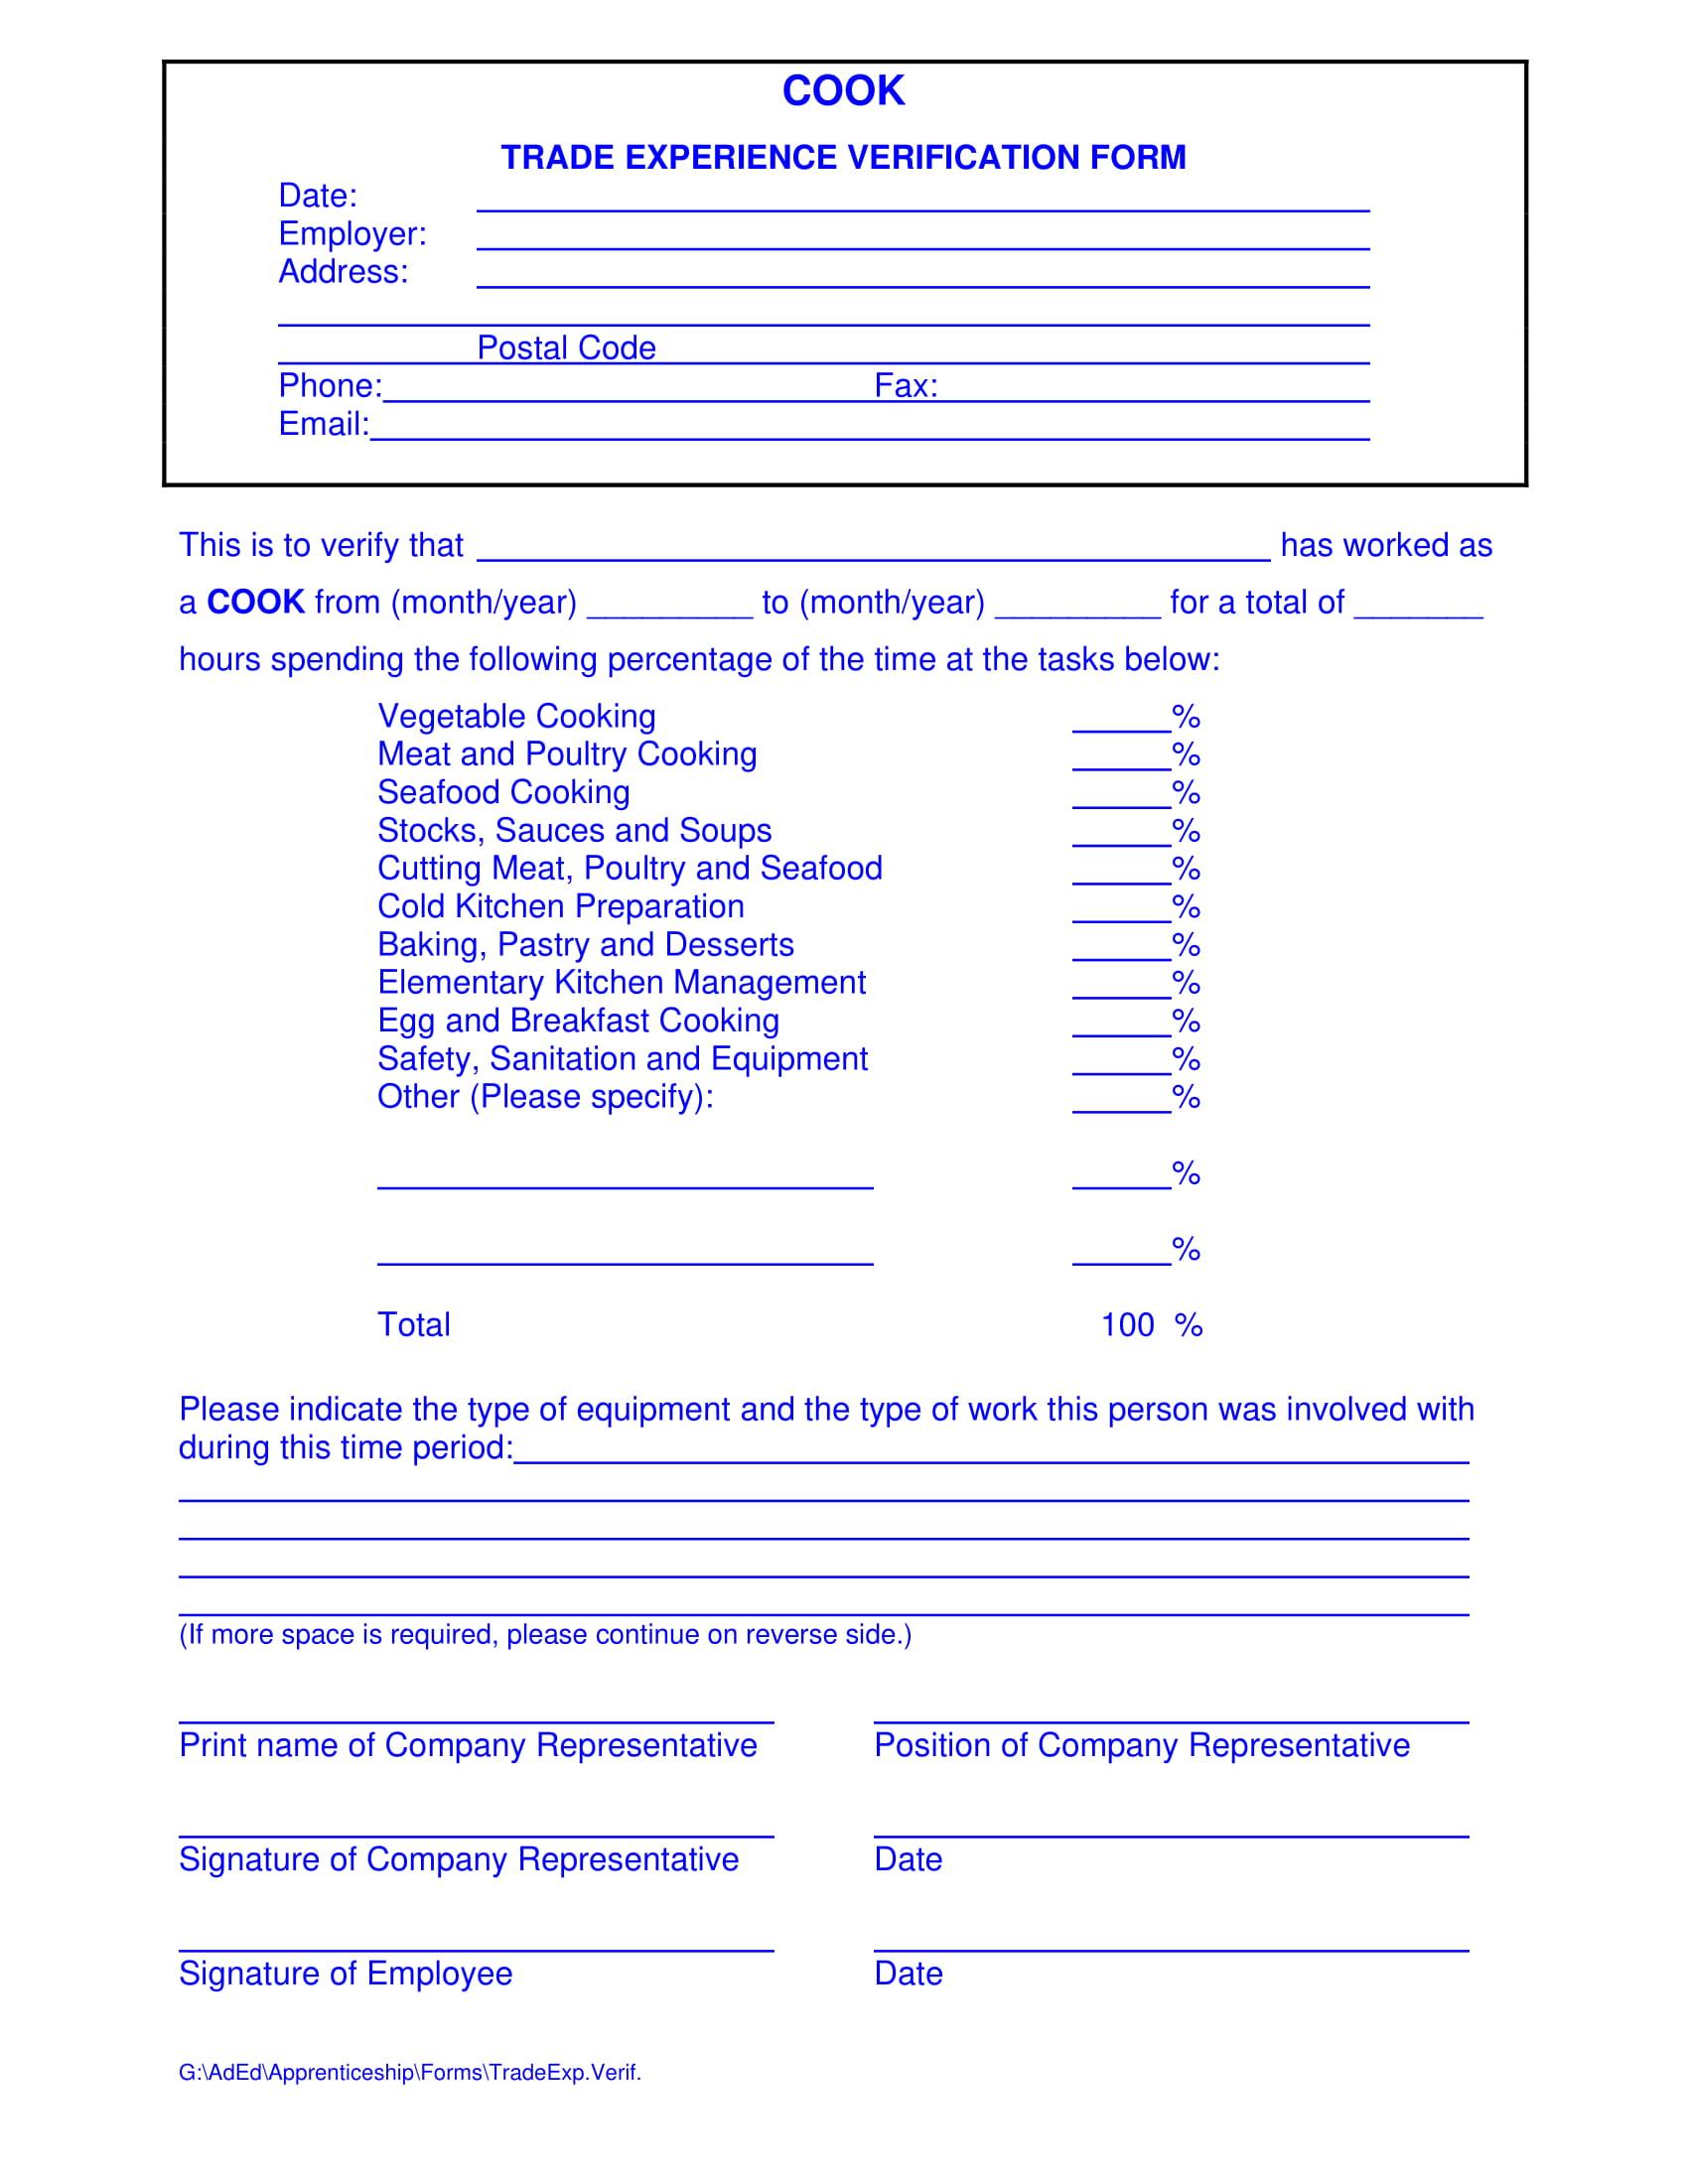 restaurant employee trade experience verification form 1